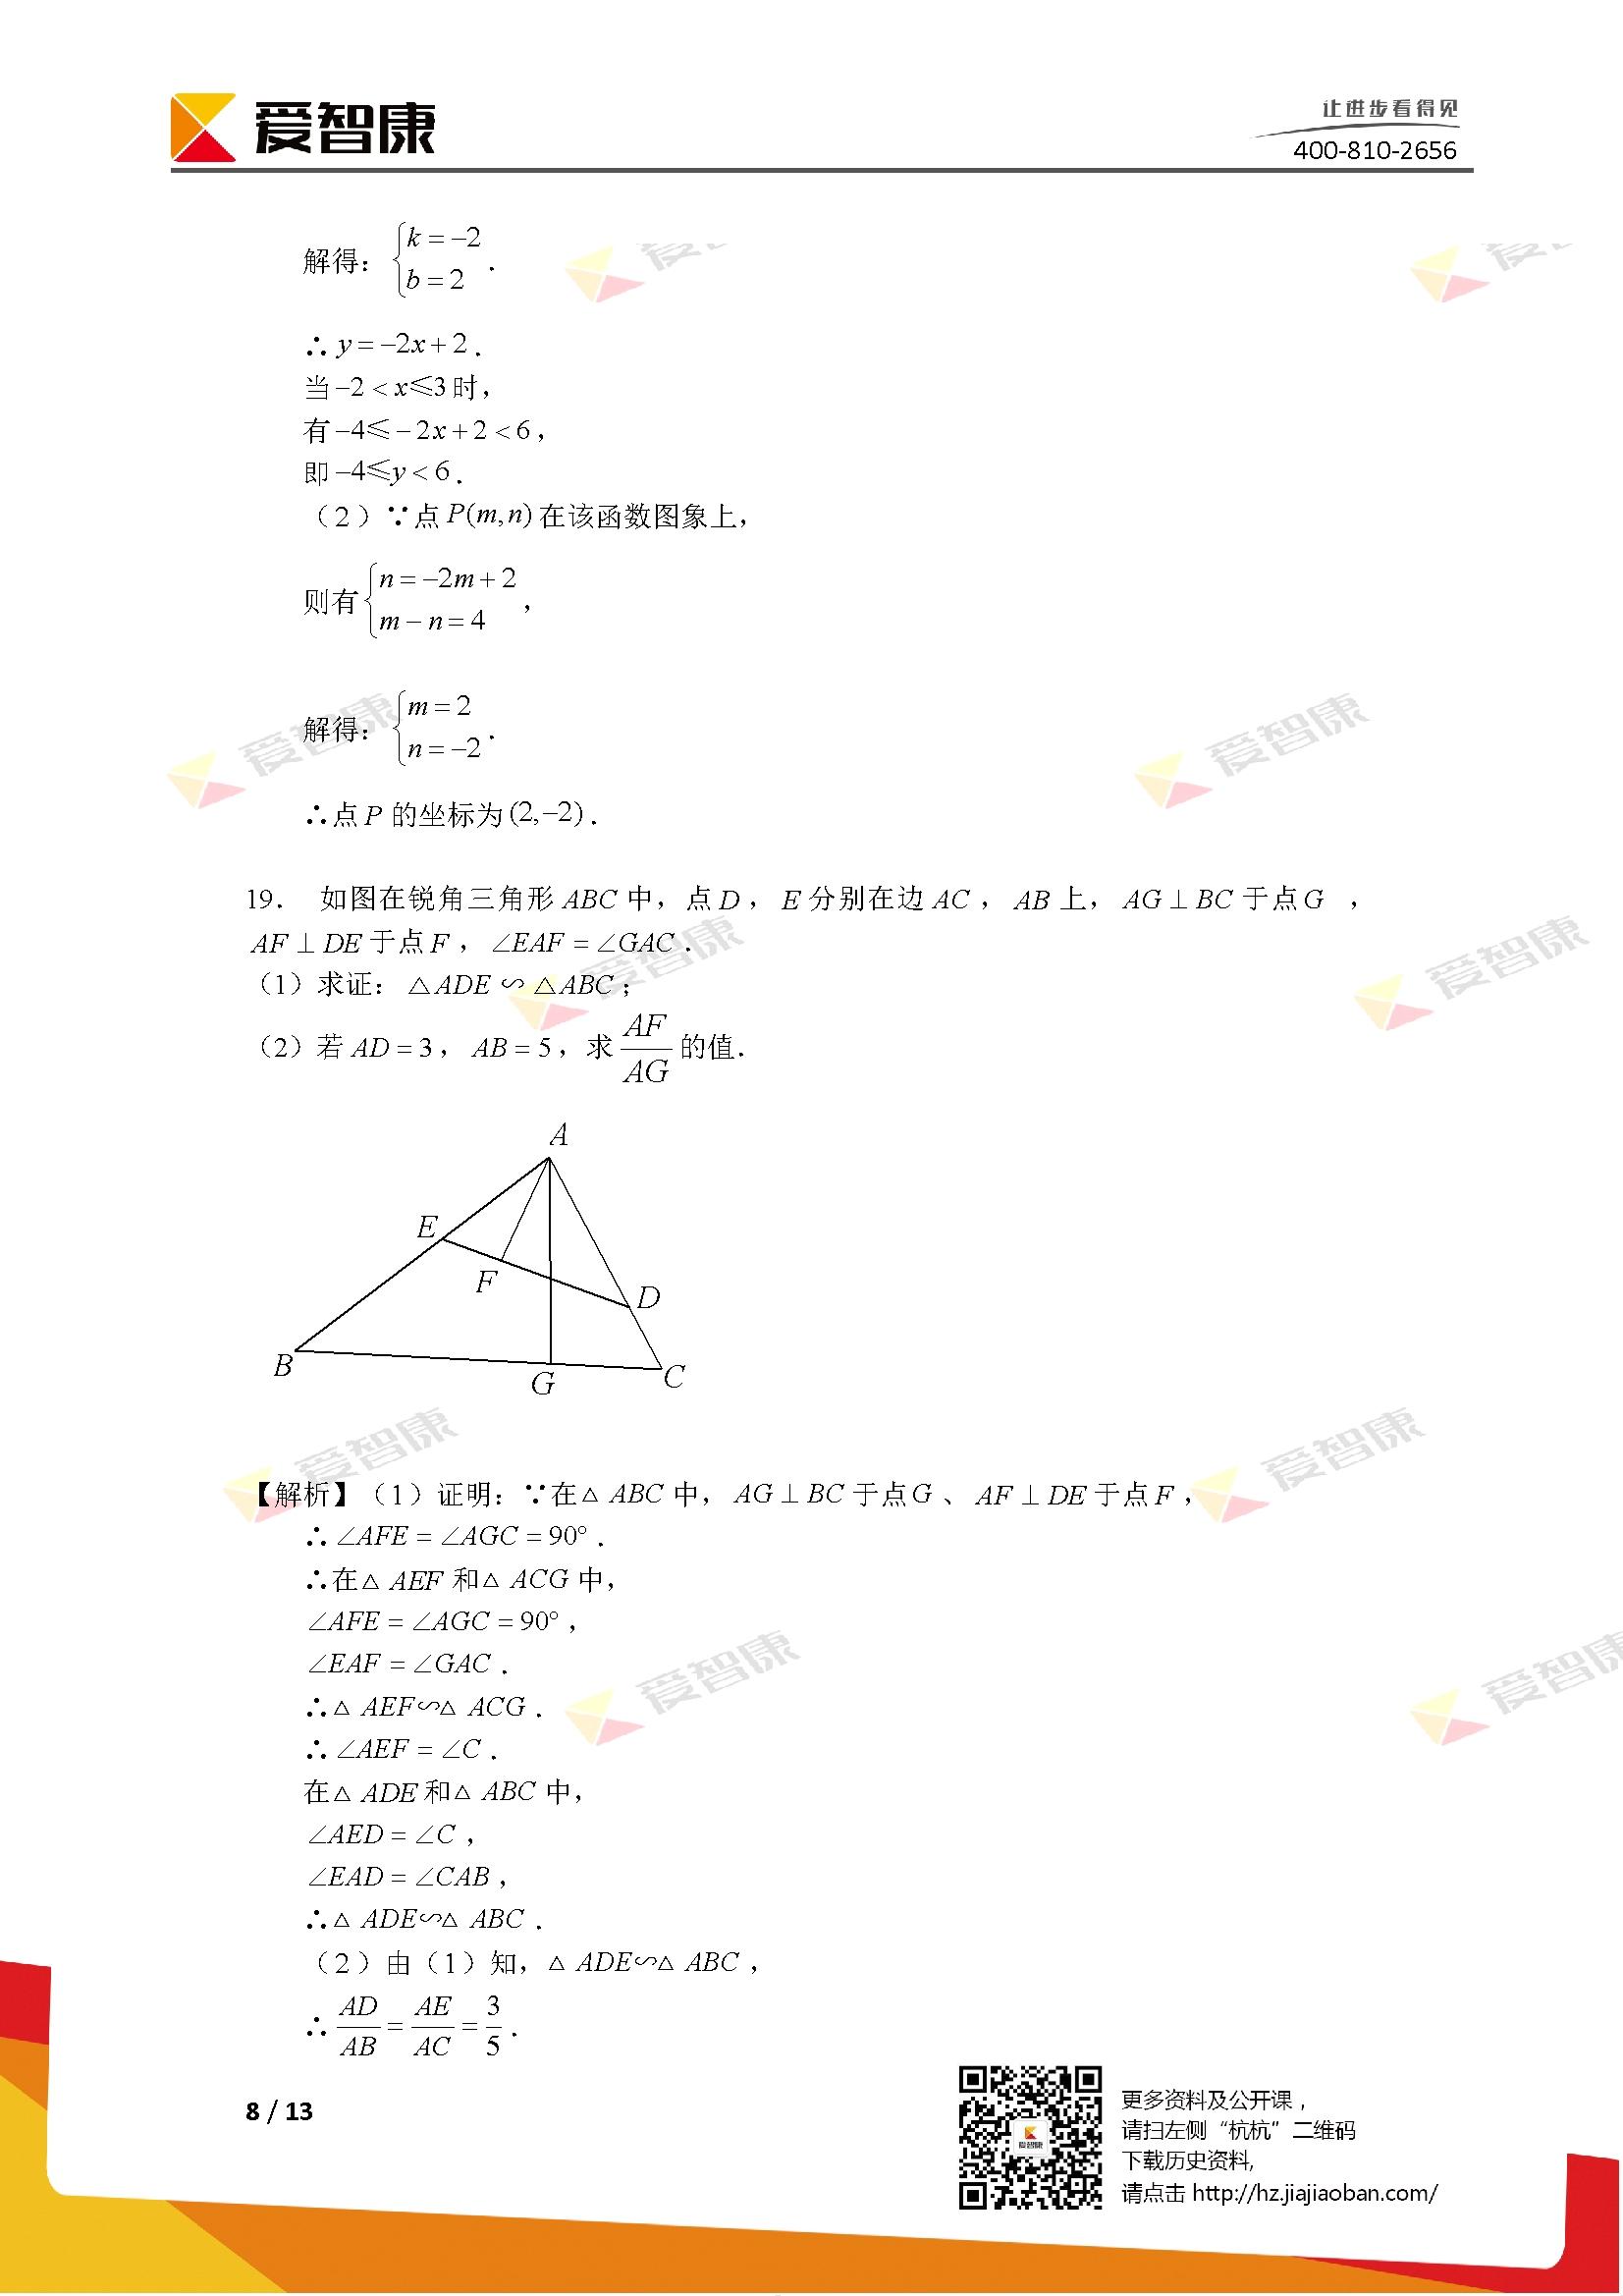 Microsoft Word - 2017年杭州市中考数学试卷解析28.jpg